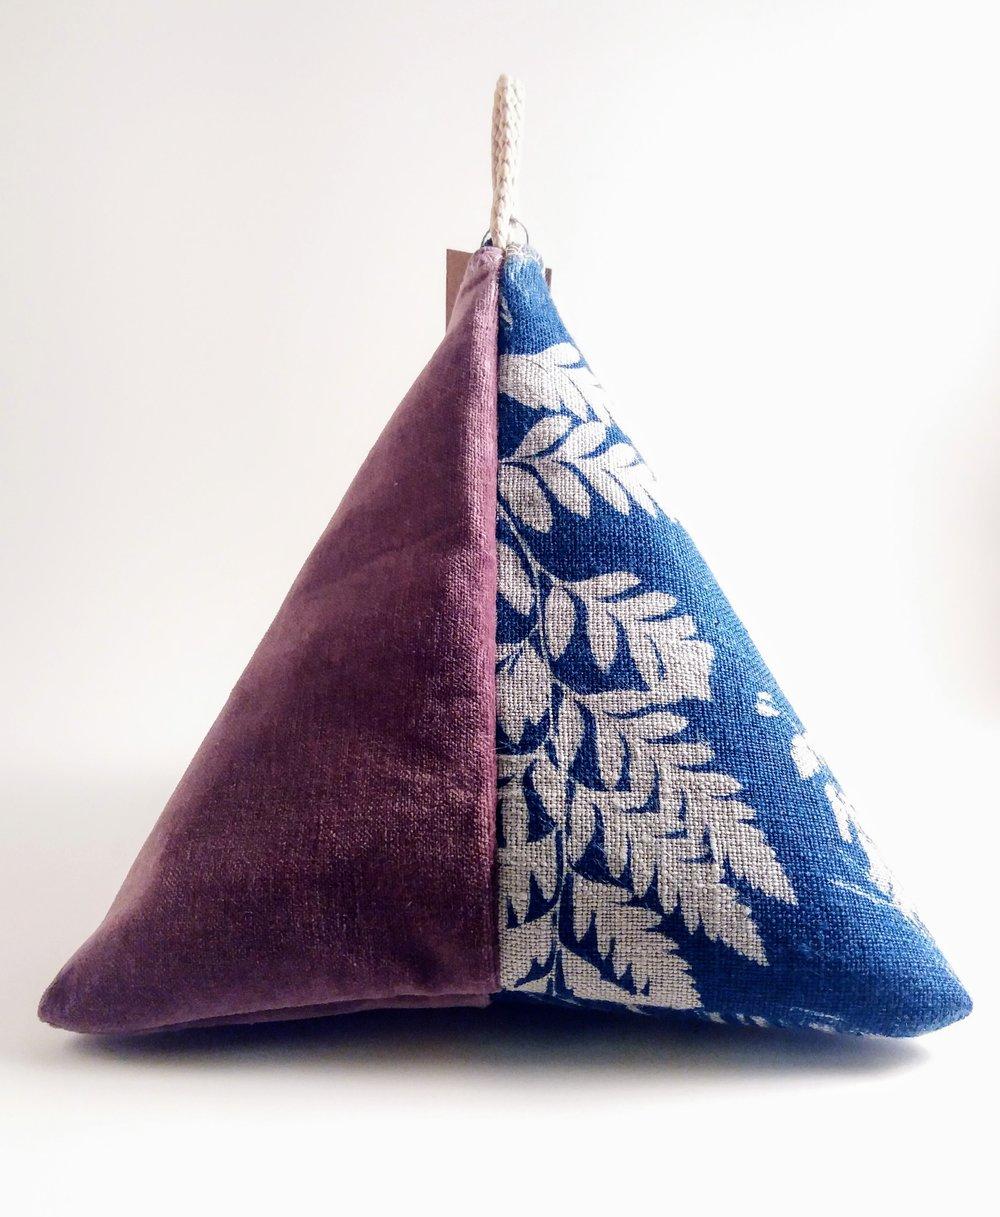 Pyramid Pouch